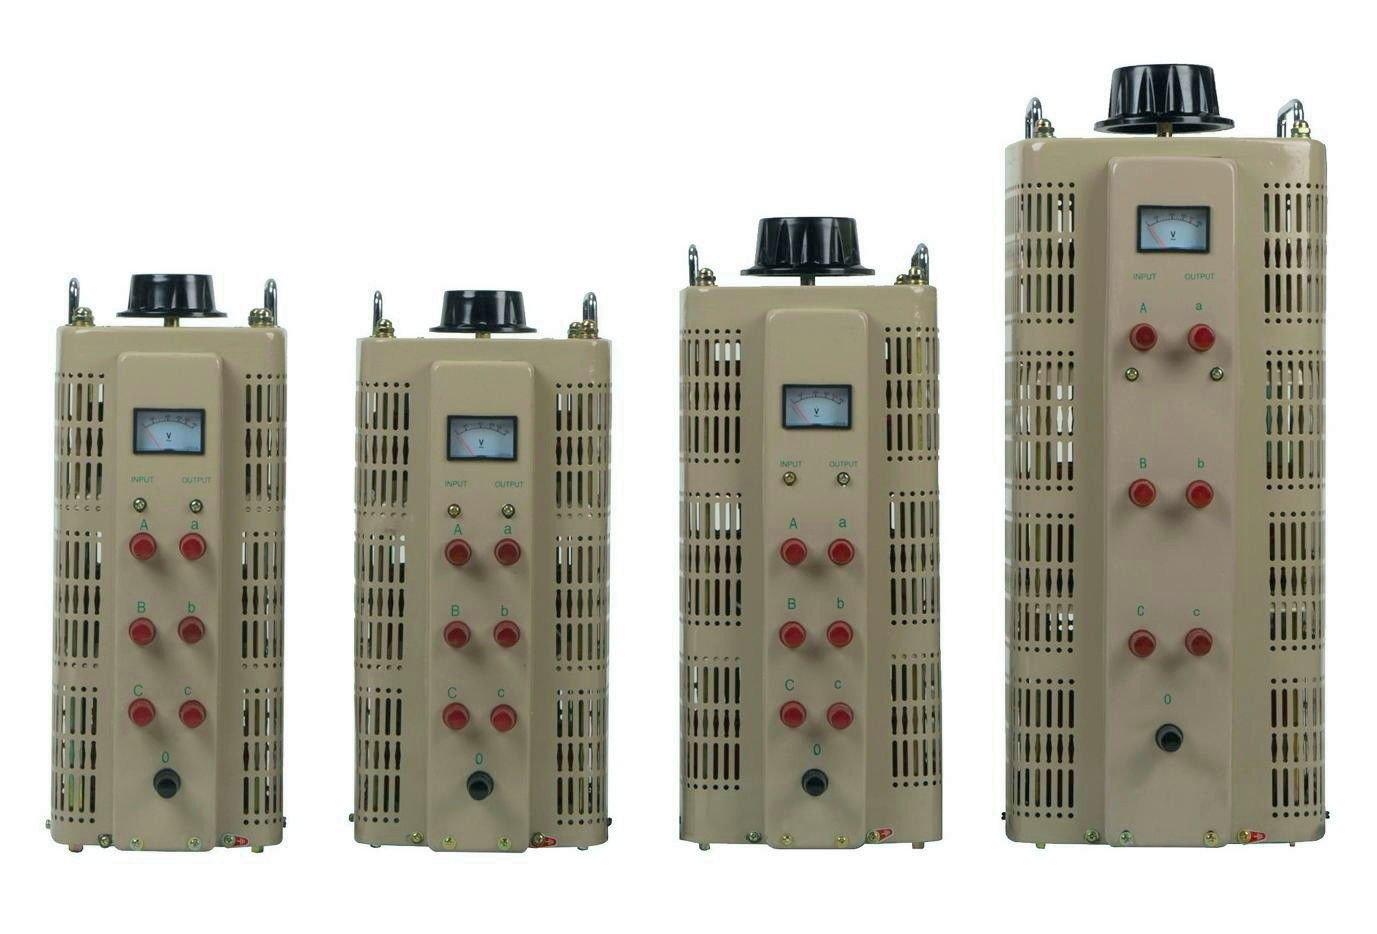 Ringkerntransformator 500W Stelltrafo Regeltrafo Ringkerntrafo Trafo 0-250V 2A